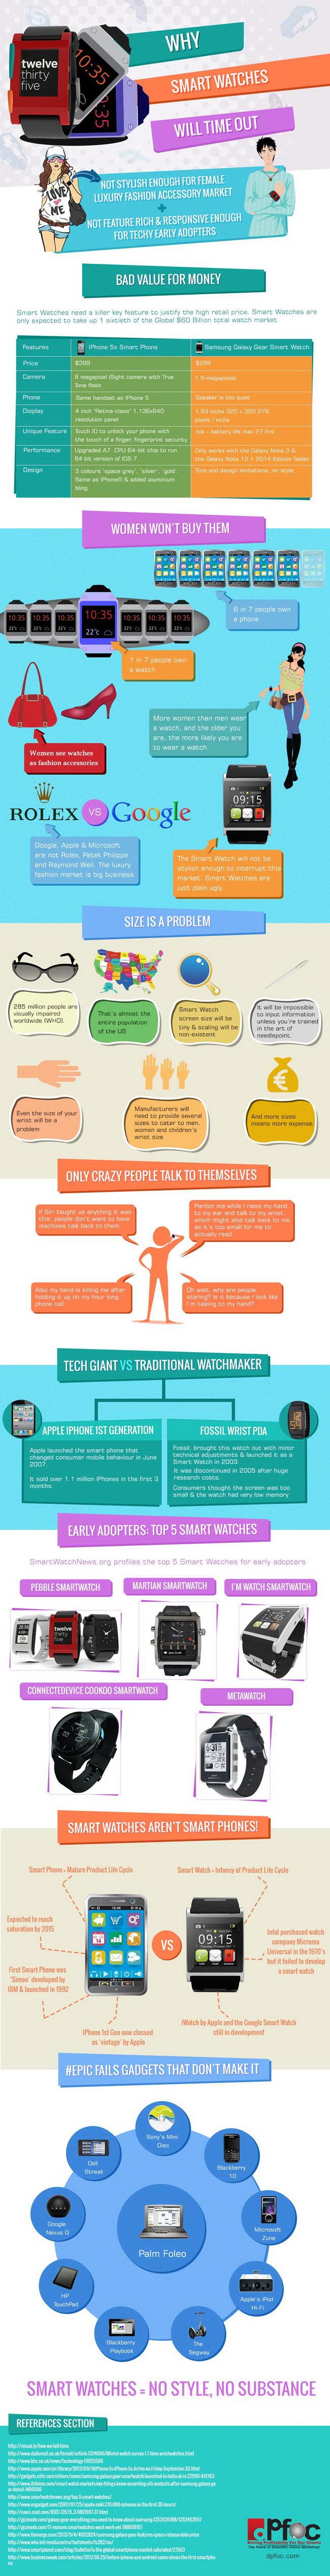 Smart Watches Vs Smartphones Comparison Infographic